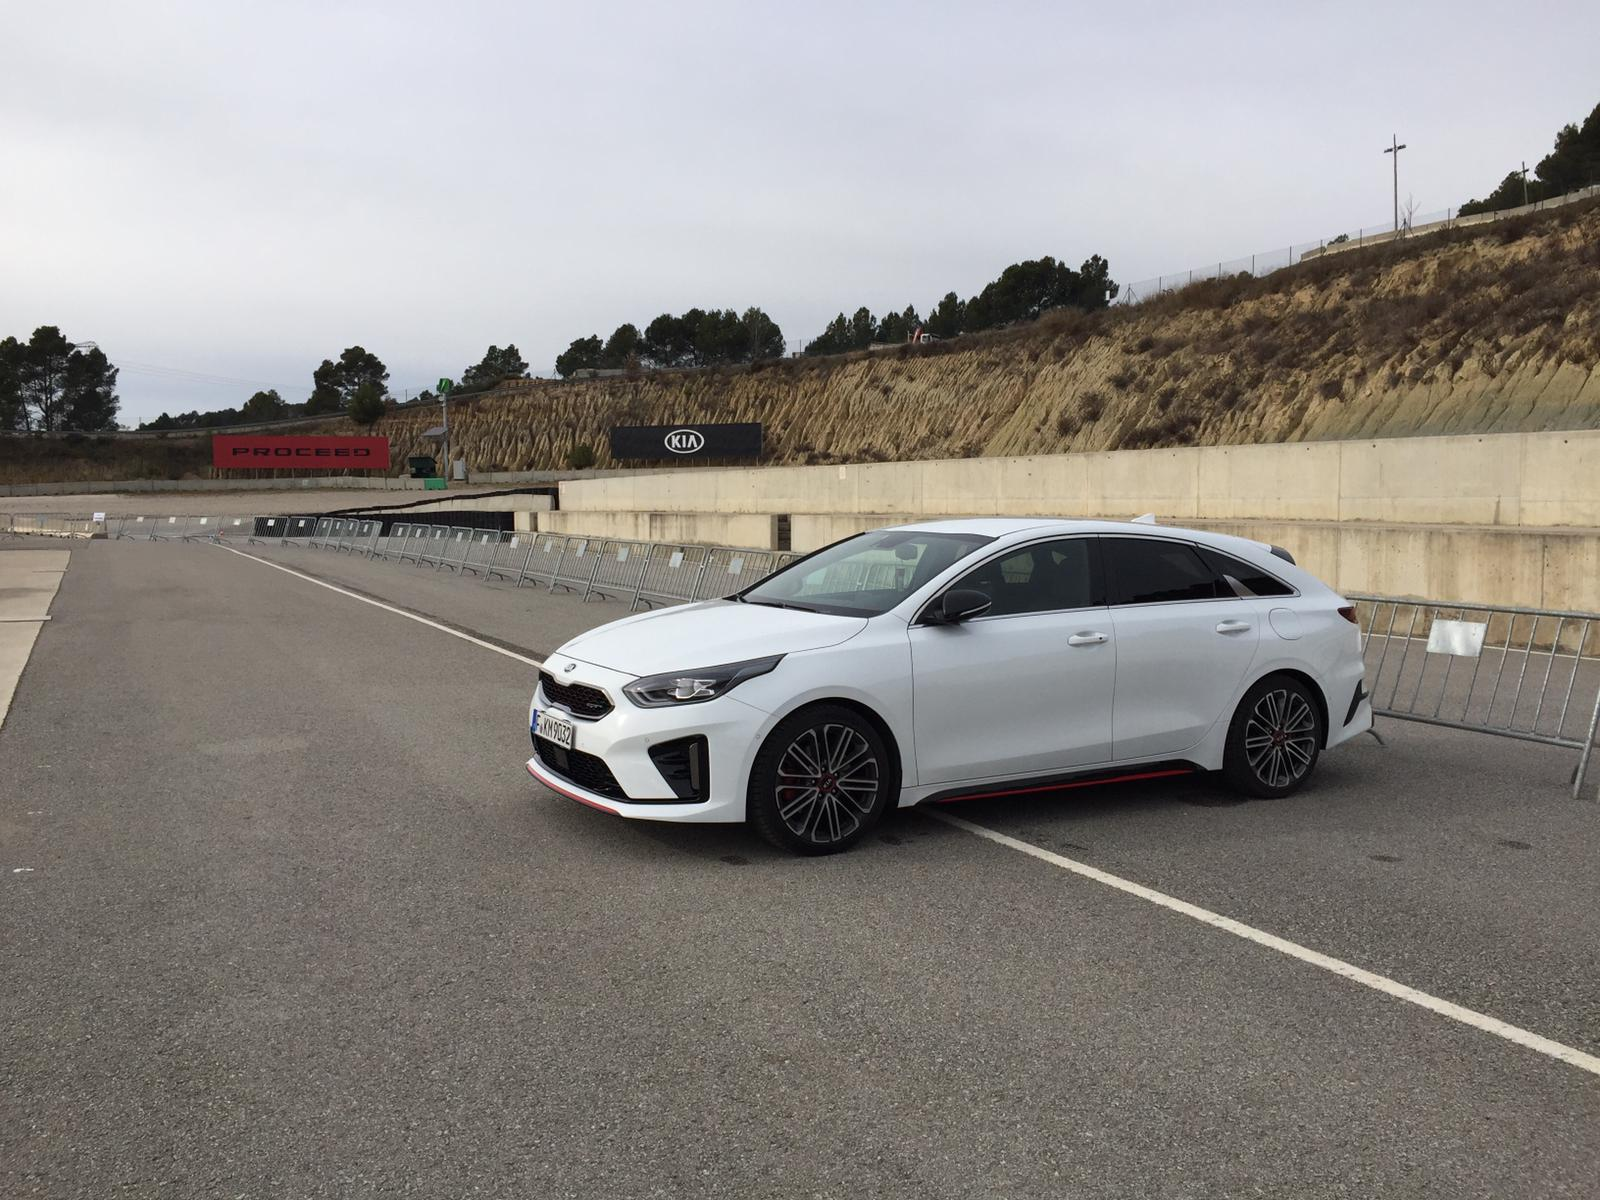 test drive Kia Proceed